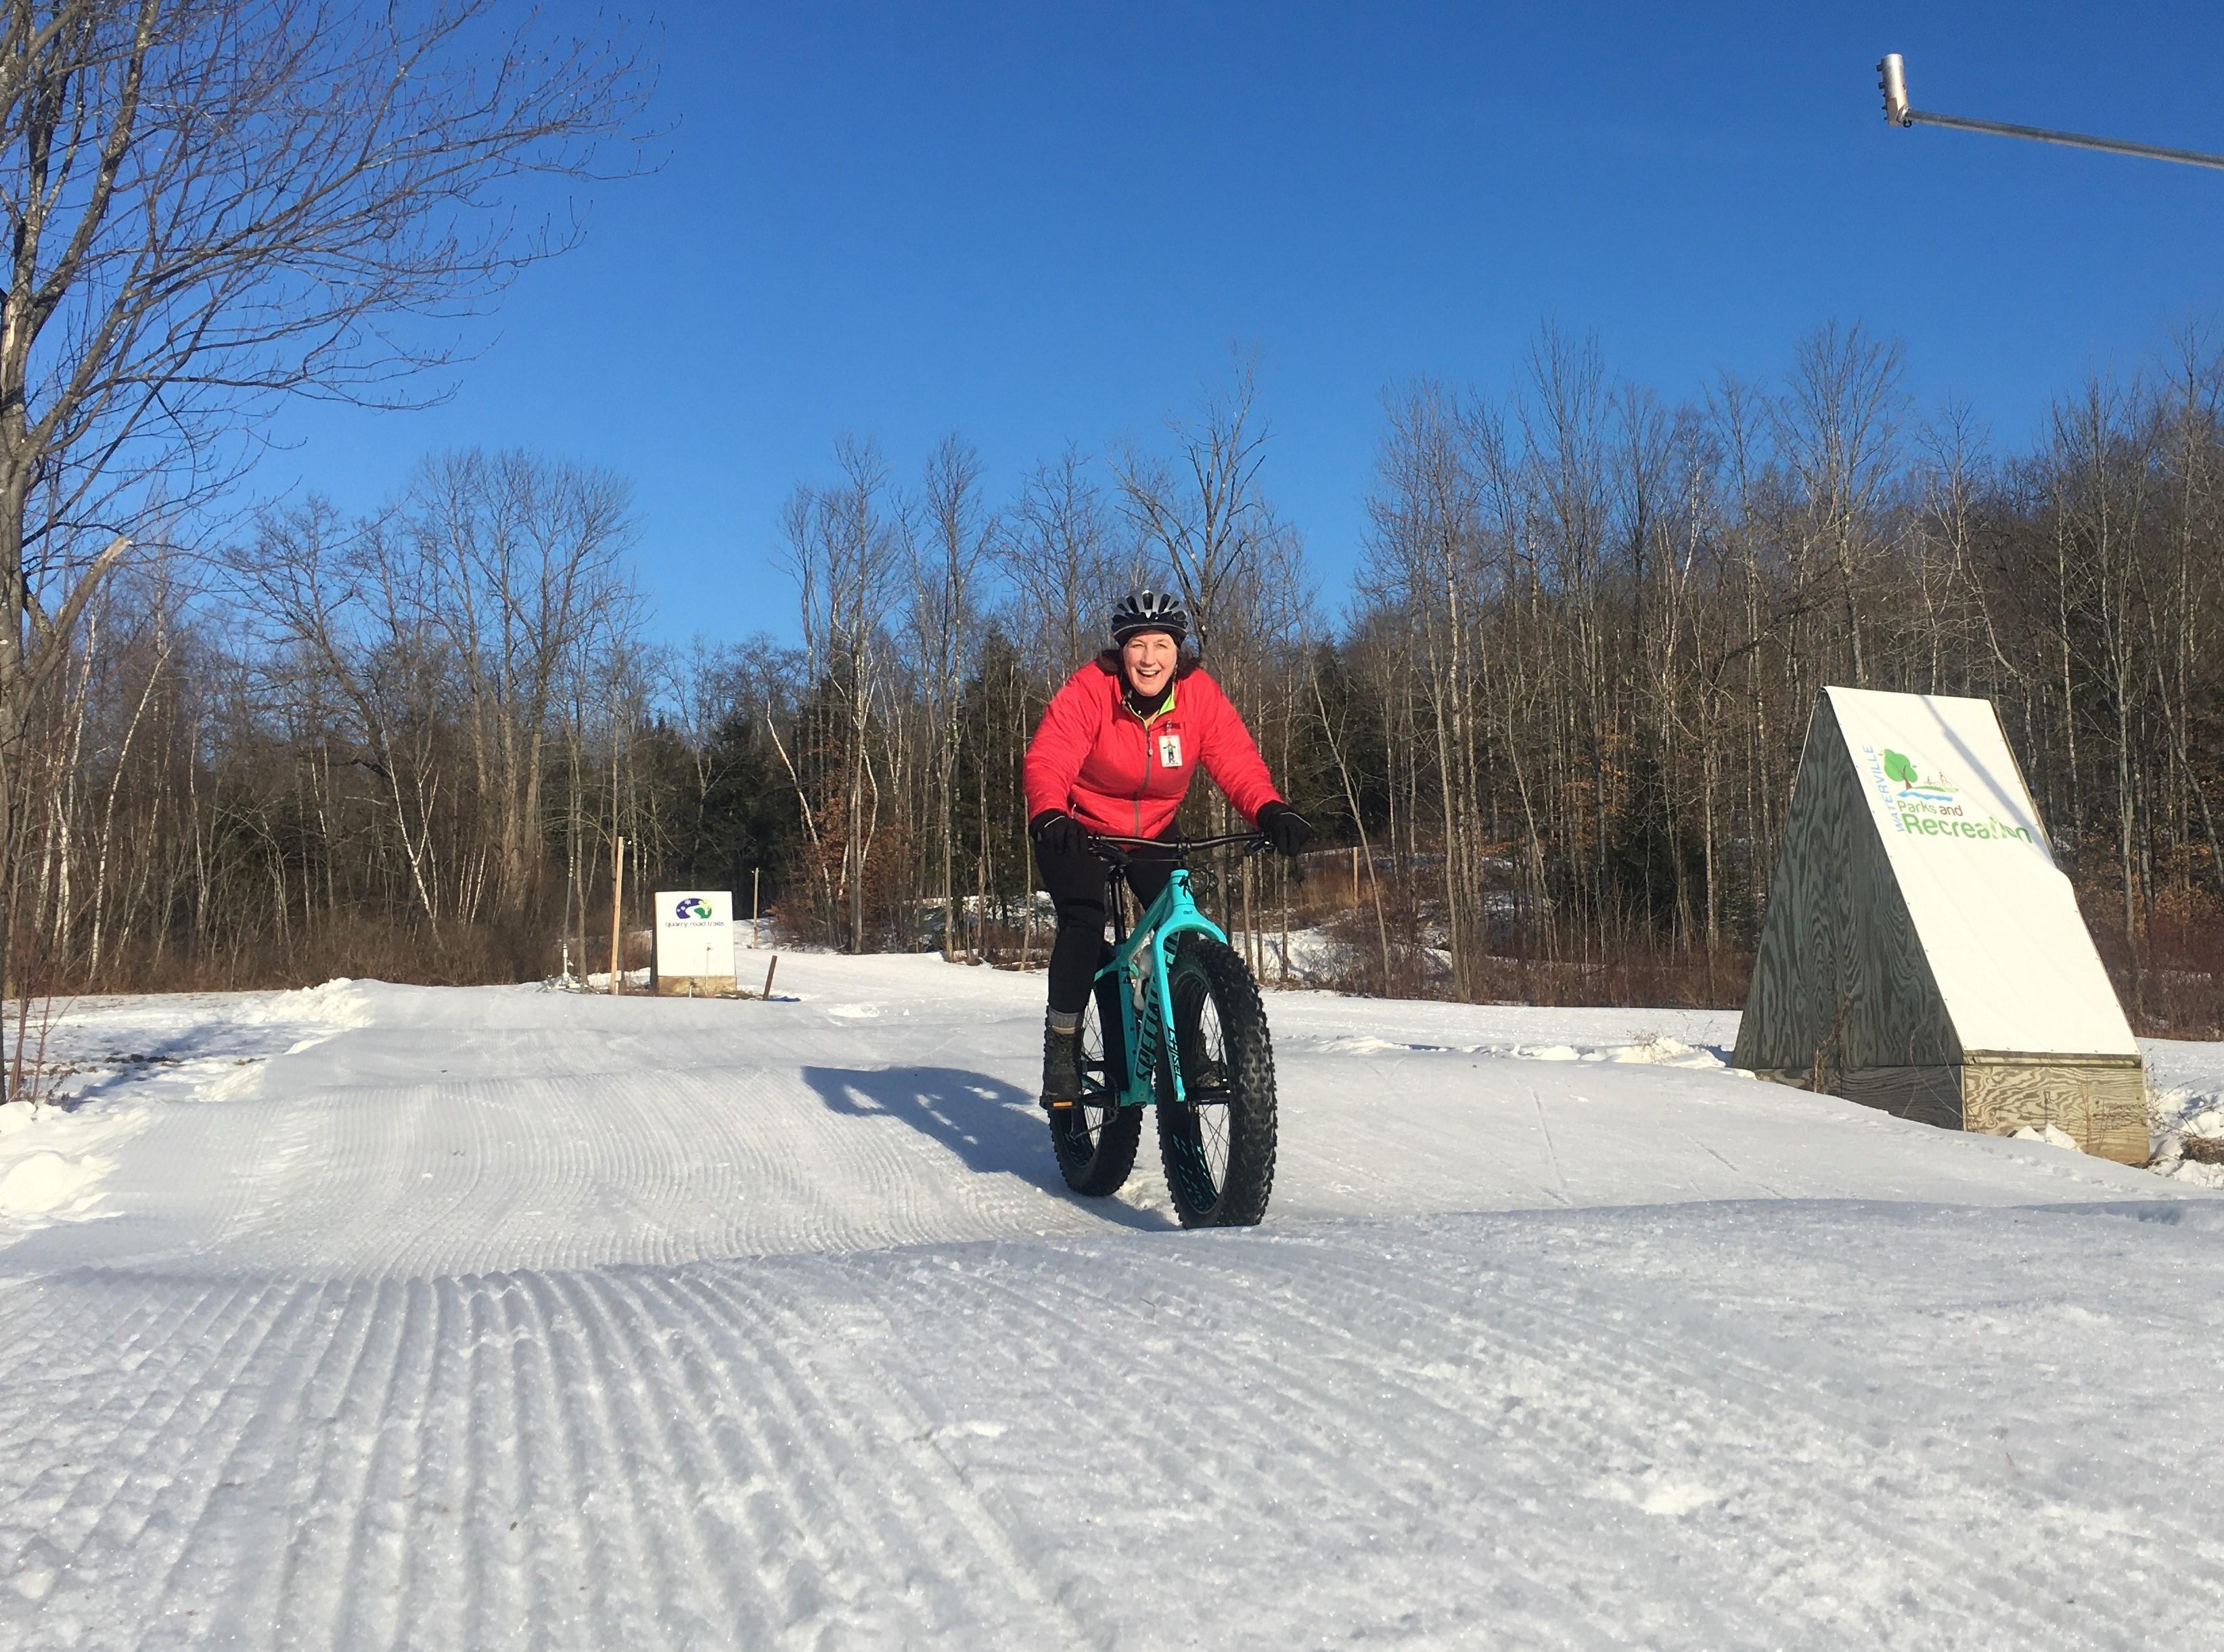 Biking on Quarry Road Trails in Maine